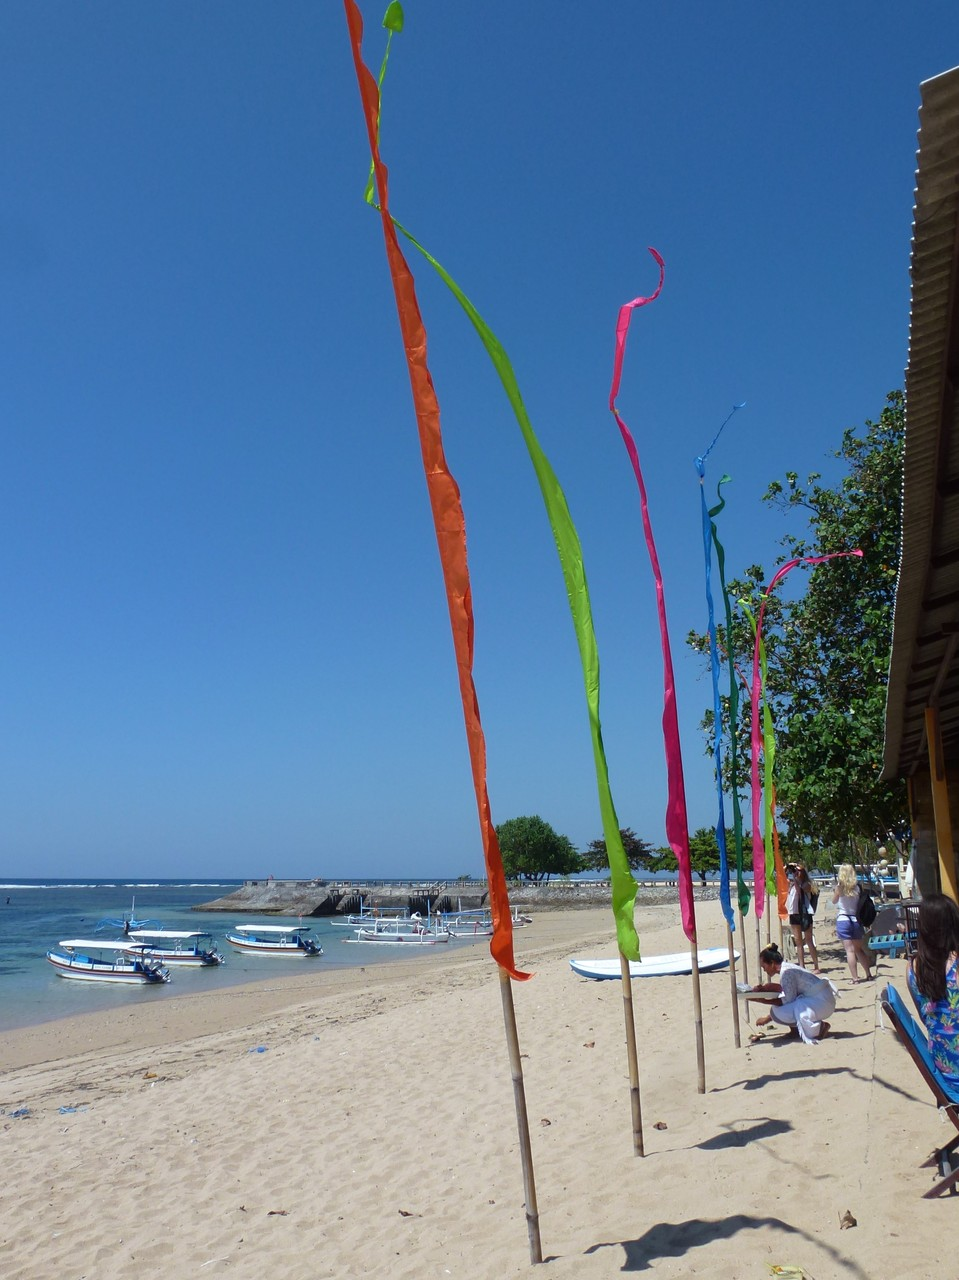 Bild: Bali-Fahnen - Foto 3